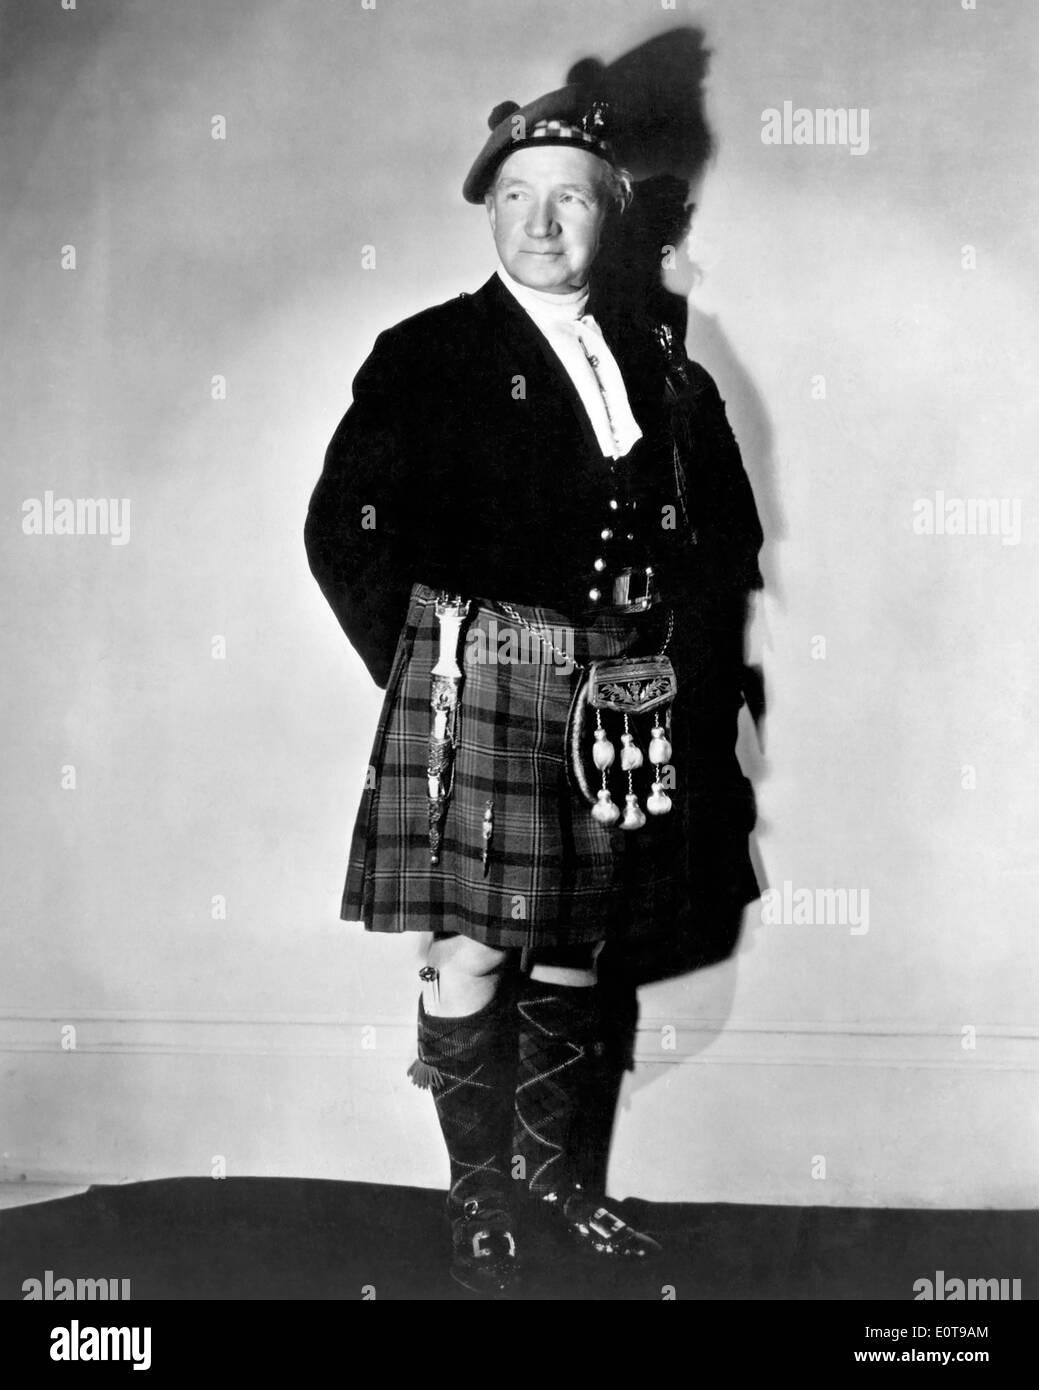 Sir Harry Lauder, Scottish Comedian and Singer, Portrait in Kilt, circa 1930's - Stock Image